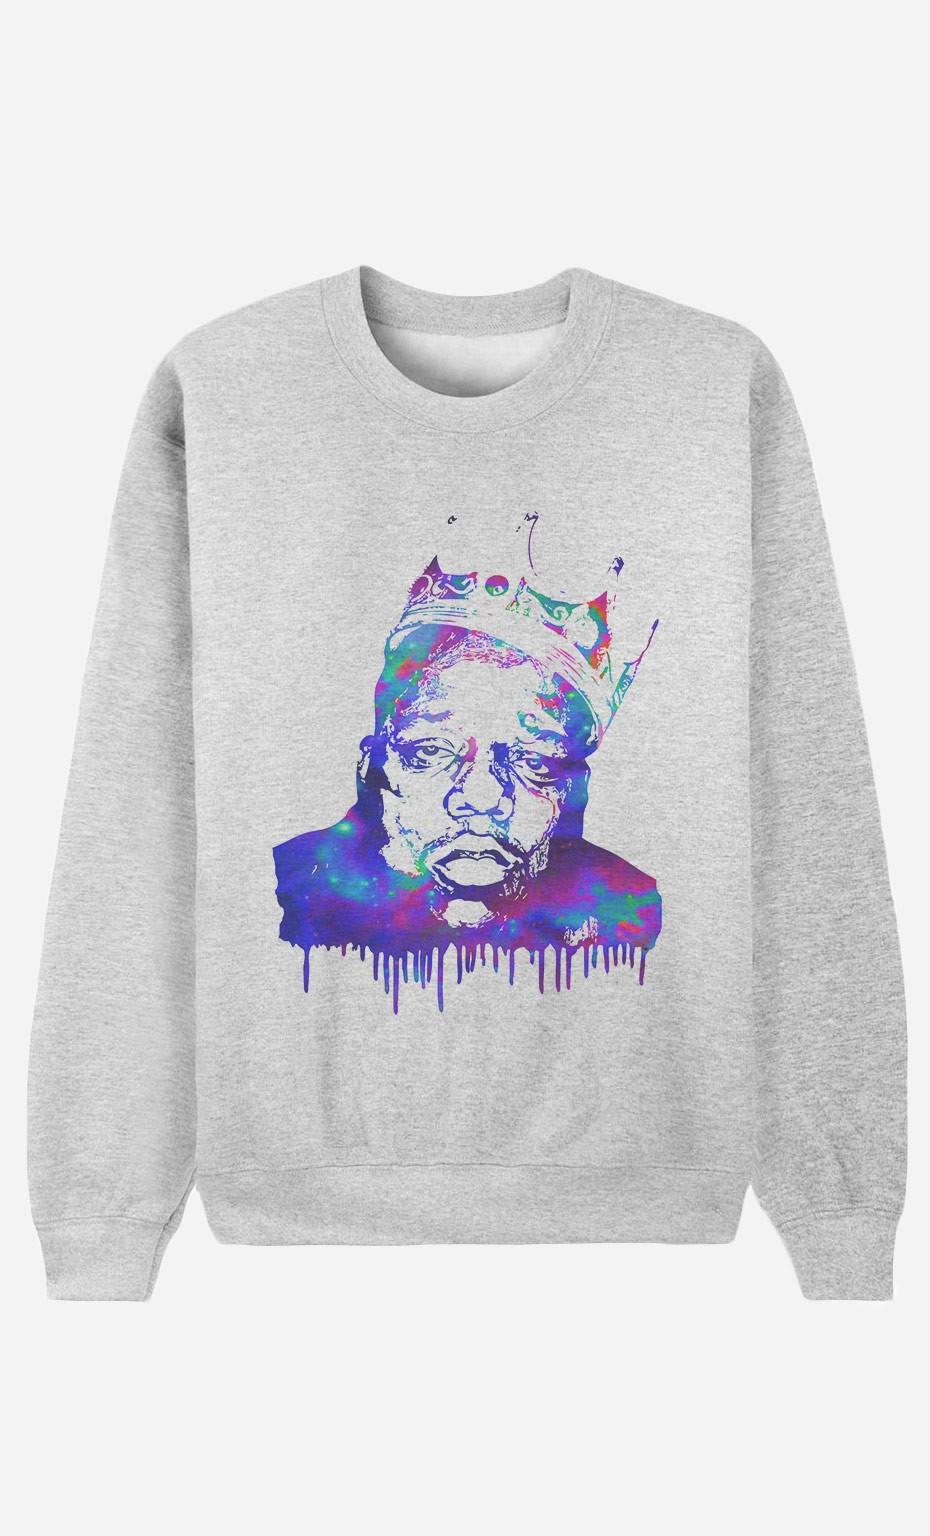 Sweatshirt Notorious